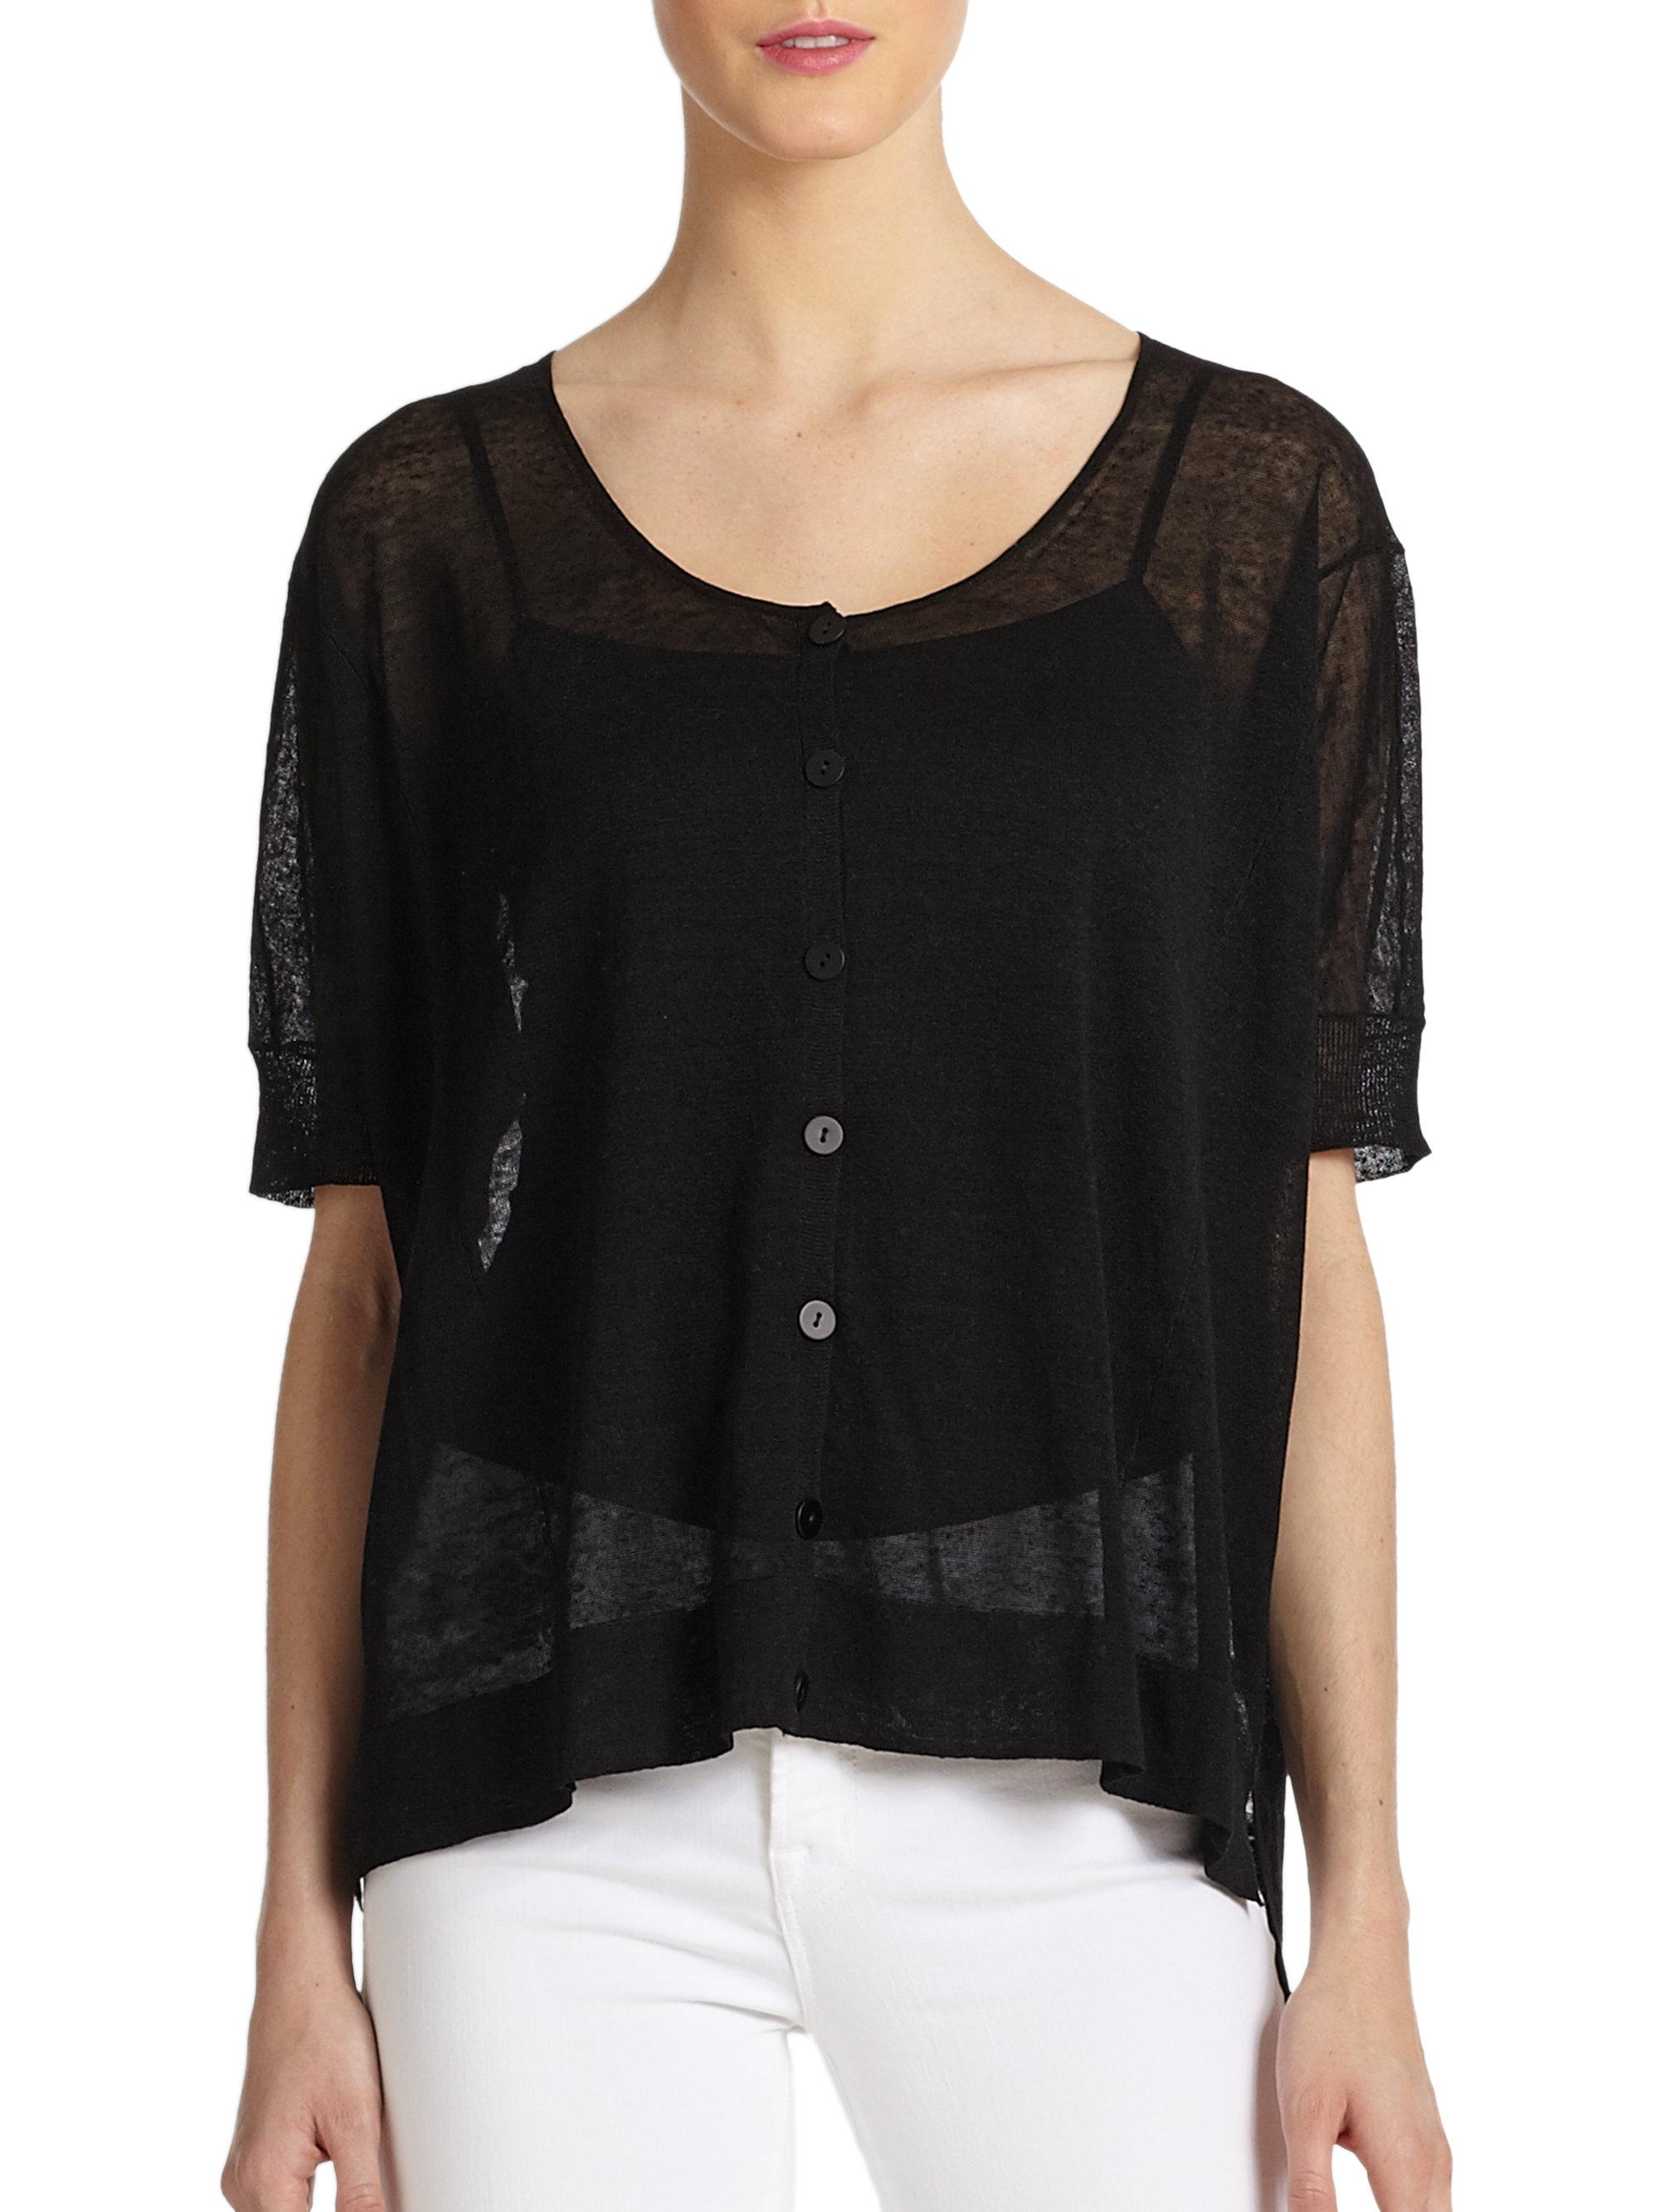 Eileen fisher Sheer Short Sleeve Hilo Cardigan in Black | Lyst